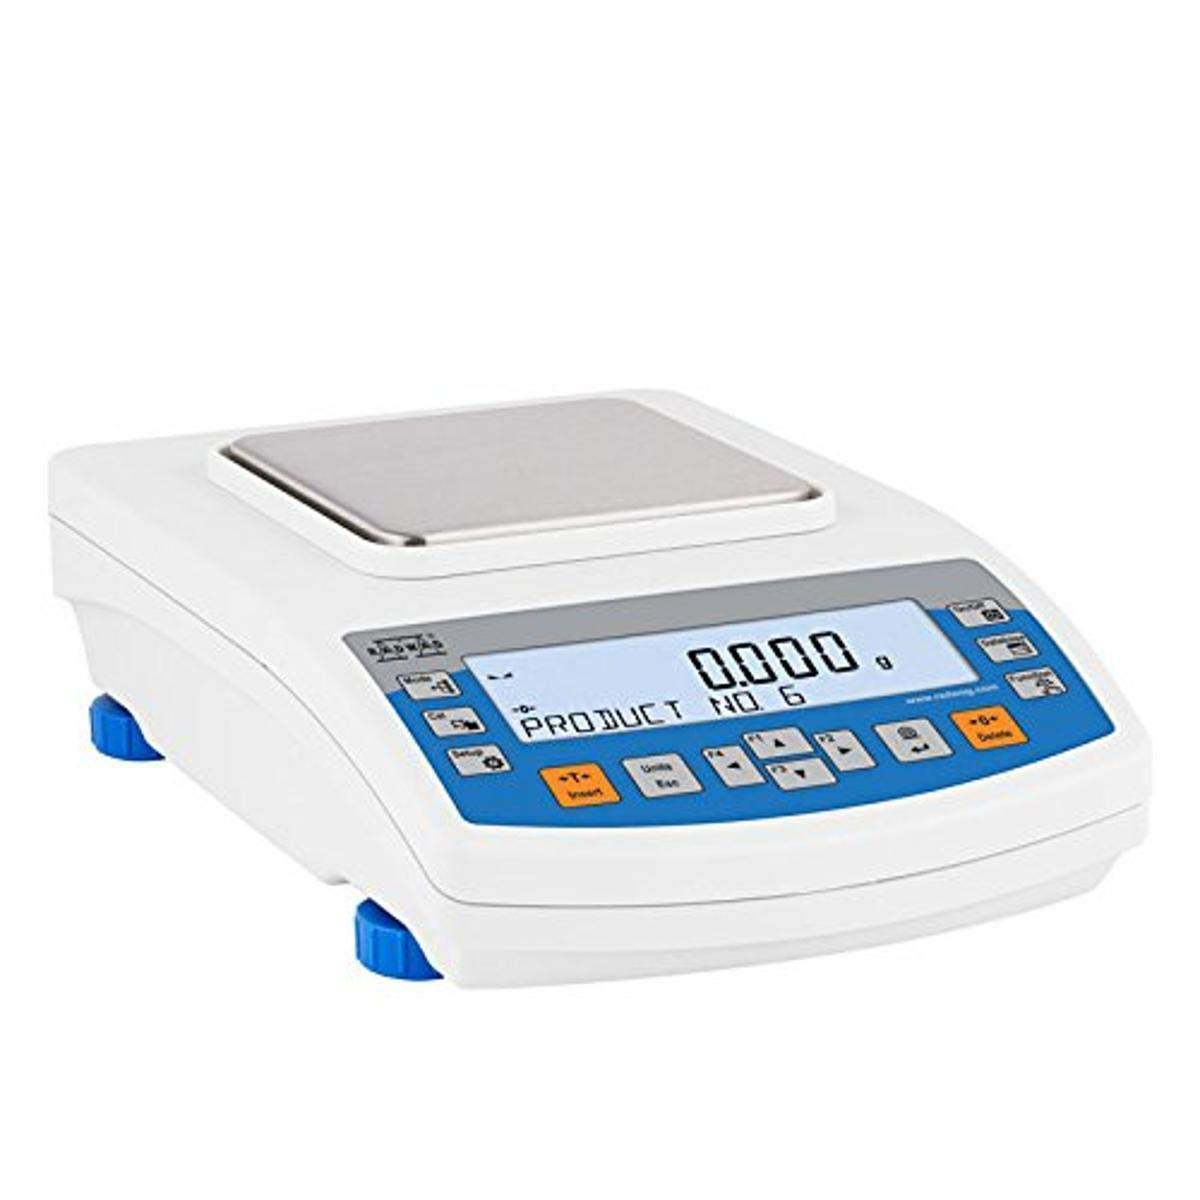 Radwag PS 1000.R2 Precision 5 ☆ very popular Scale Sale Gram 1000 EMFR 0.001 x